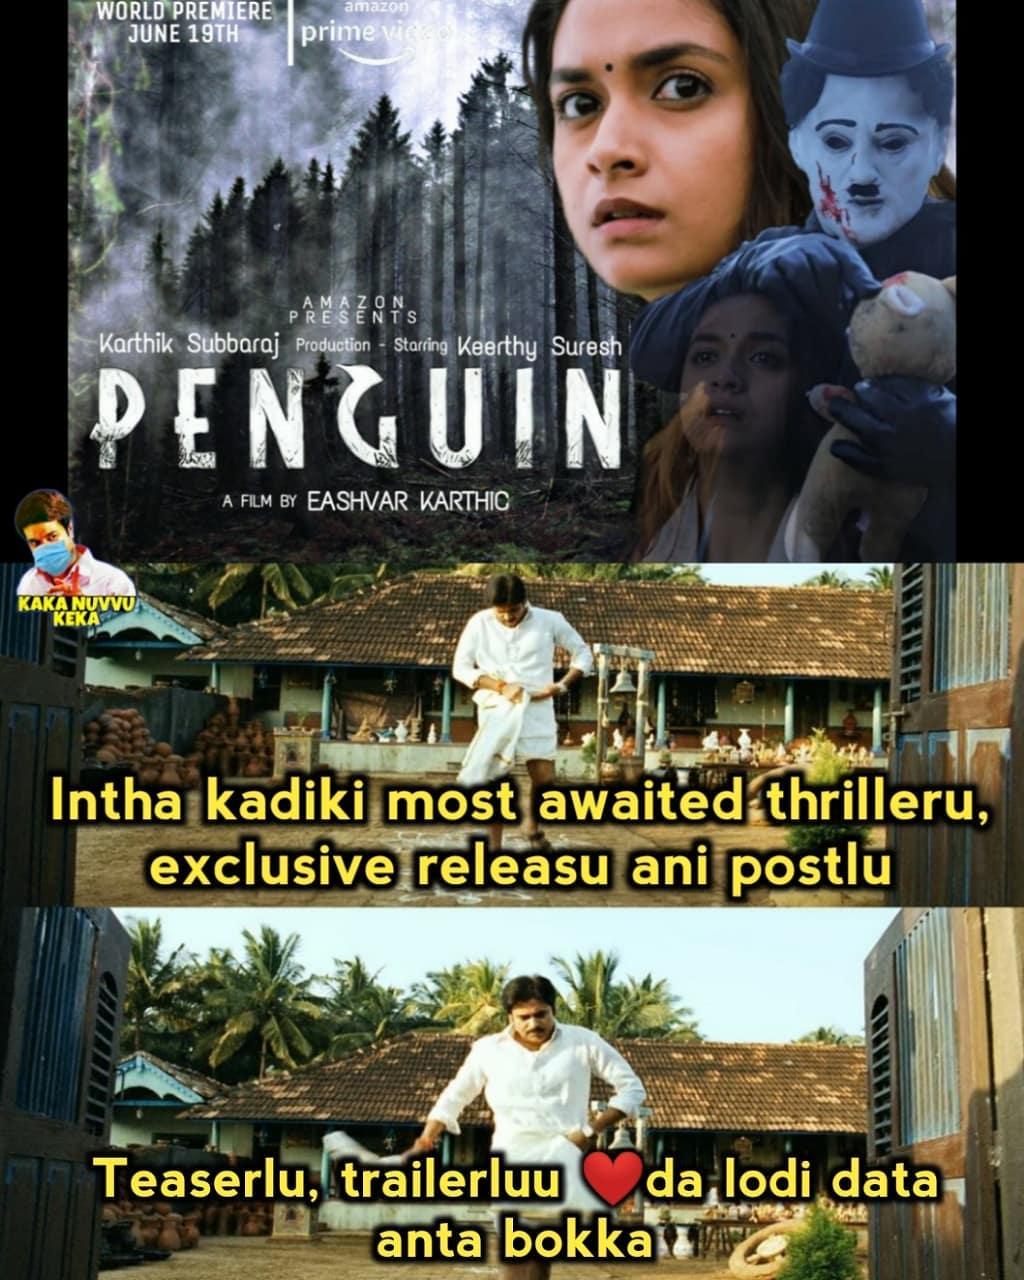 2. Penguin Movie Memes